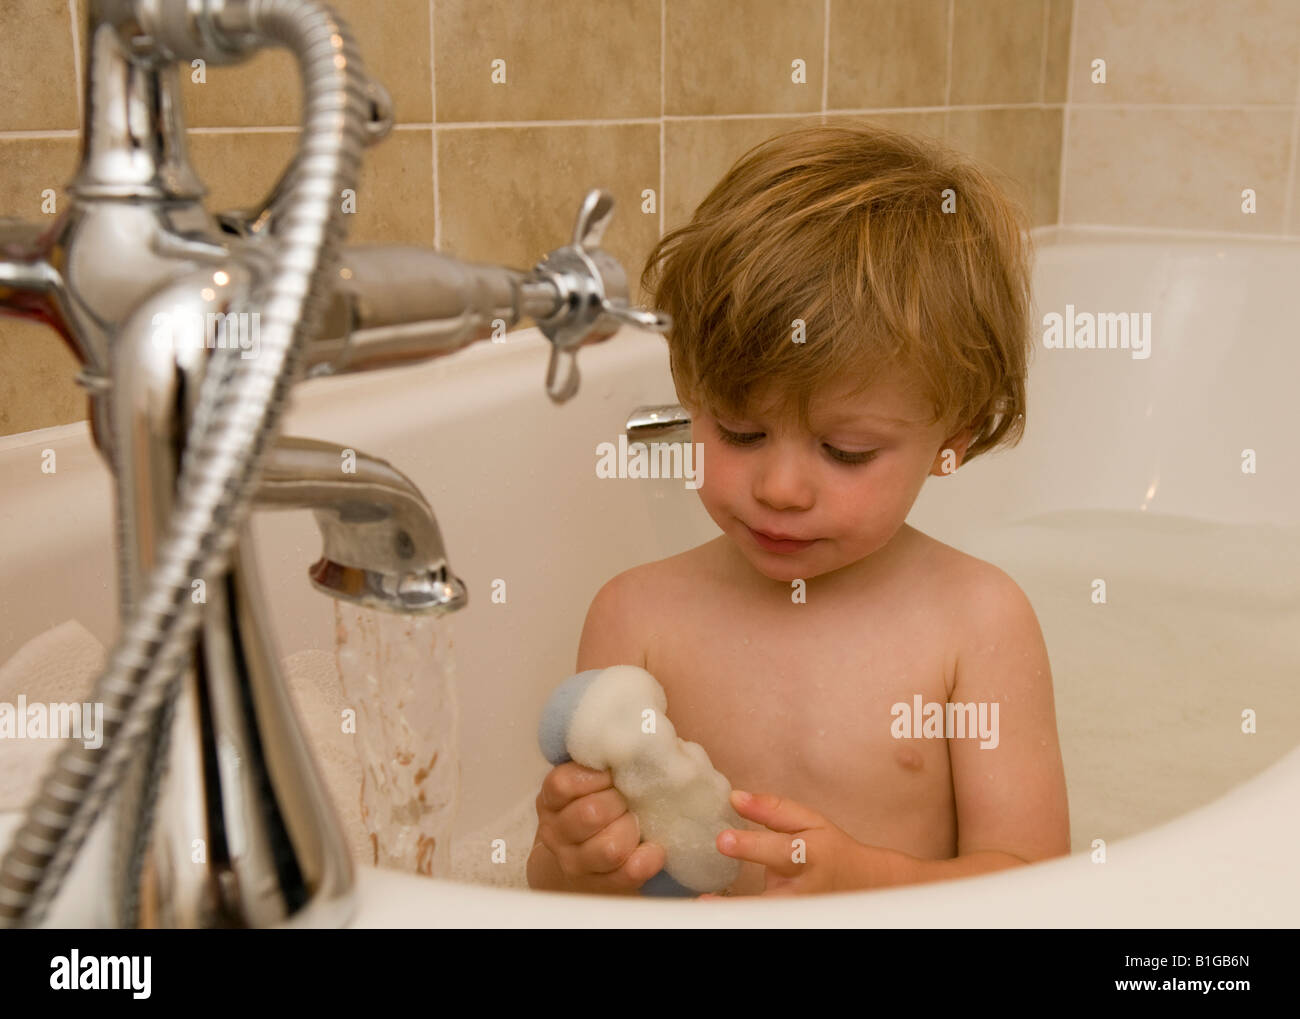 Bath Sponge For Child Stock Photos & Bath Sponge For Child Stock ...